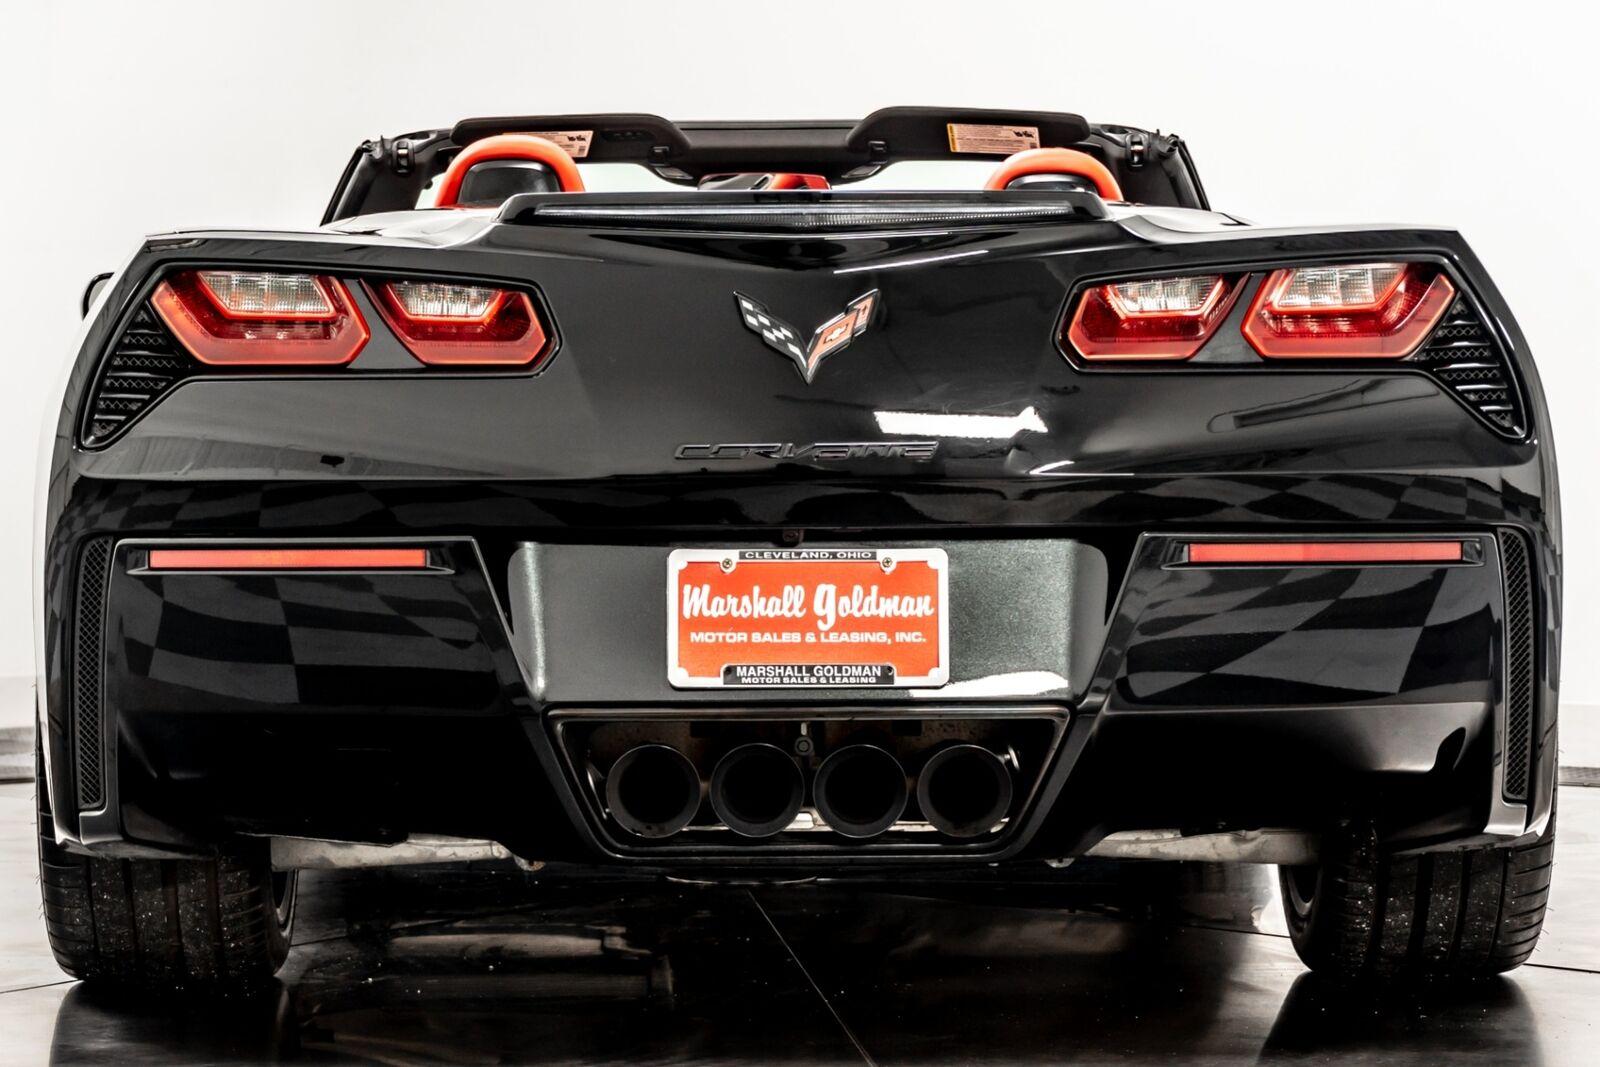 2014 Black Chevrolet Corvette Convertible 2LT   C7 Corvette Photo 7